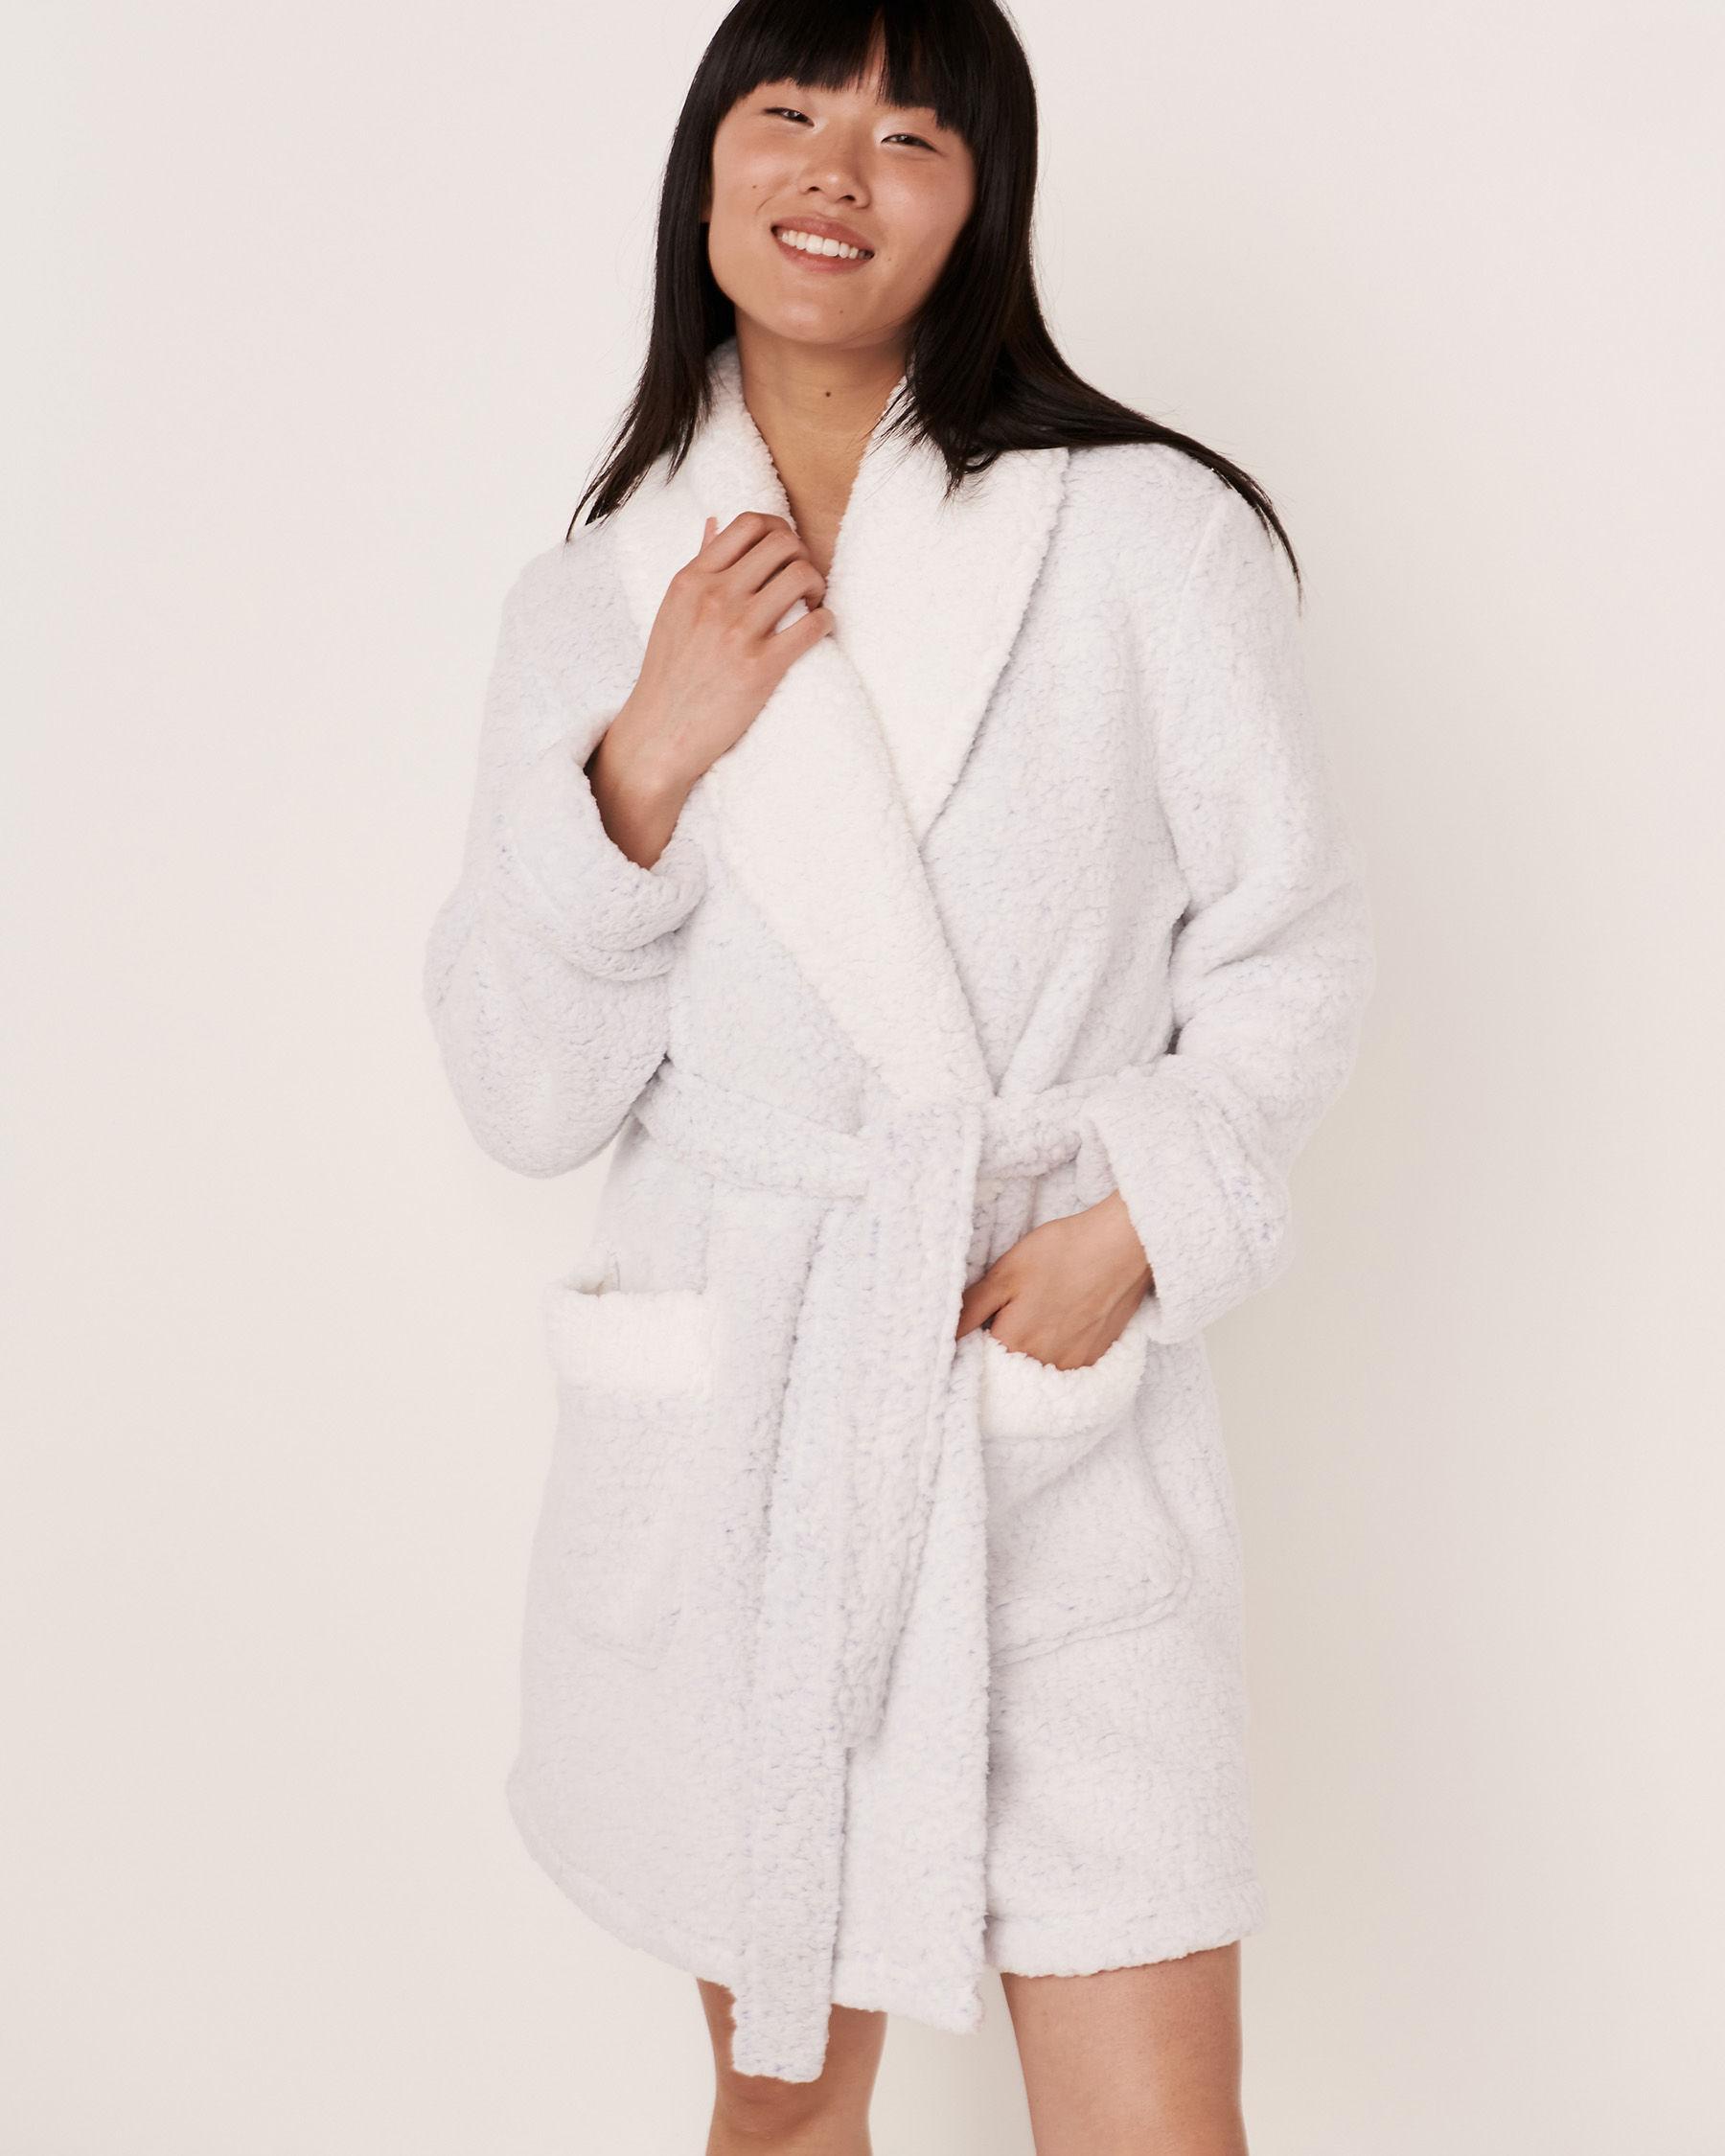 LA VIE EN ROSE Fluffy Sherpa Robe Blue 40600041 - View1